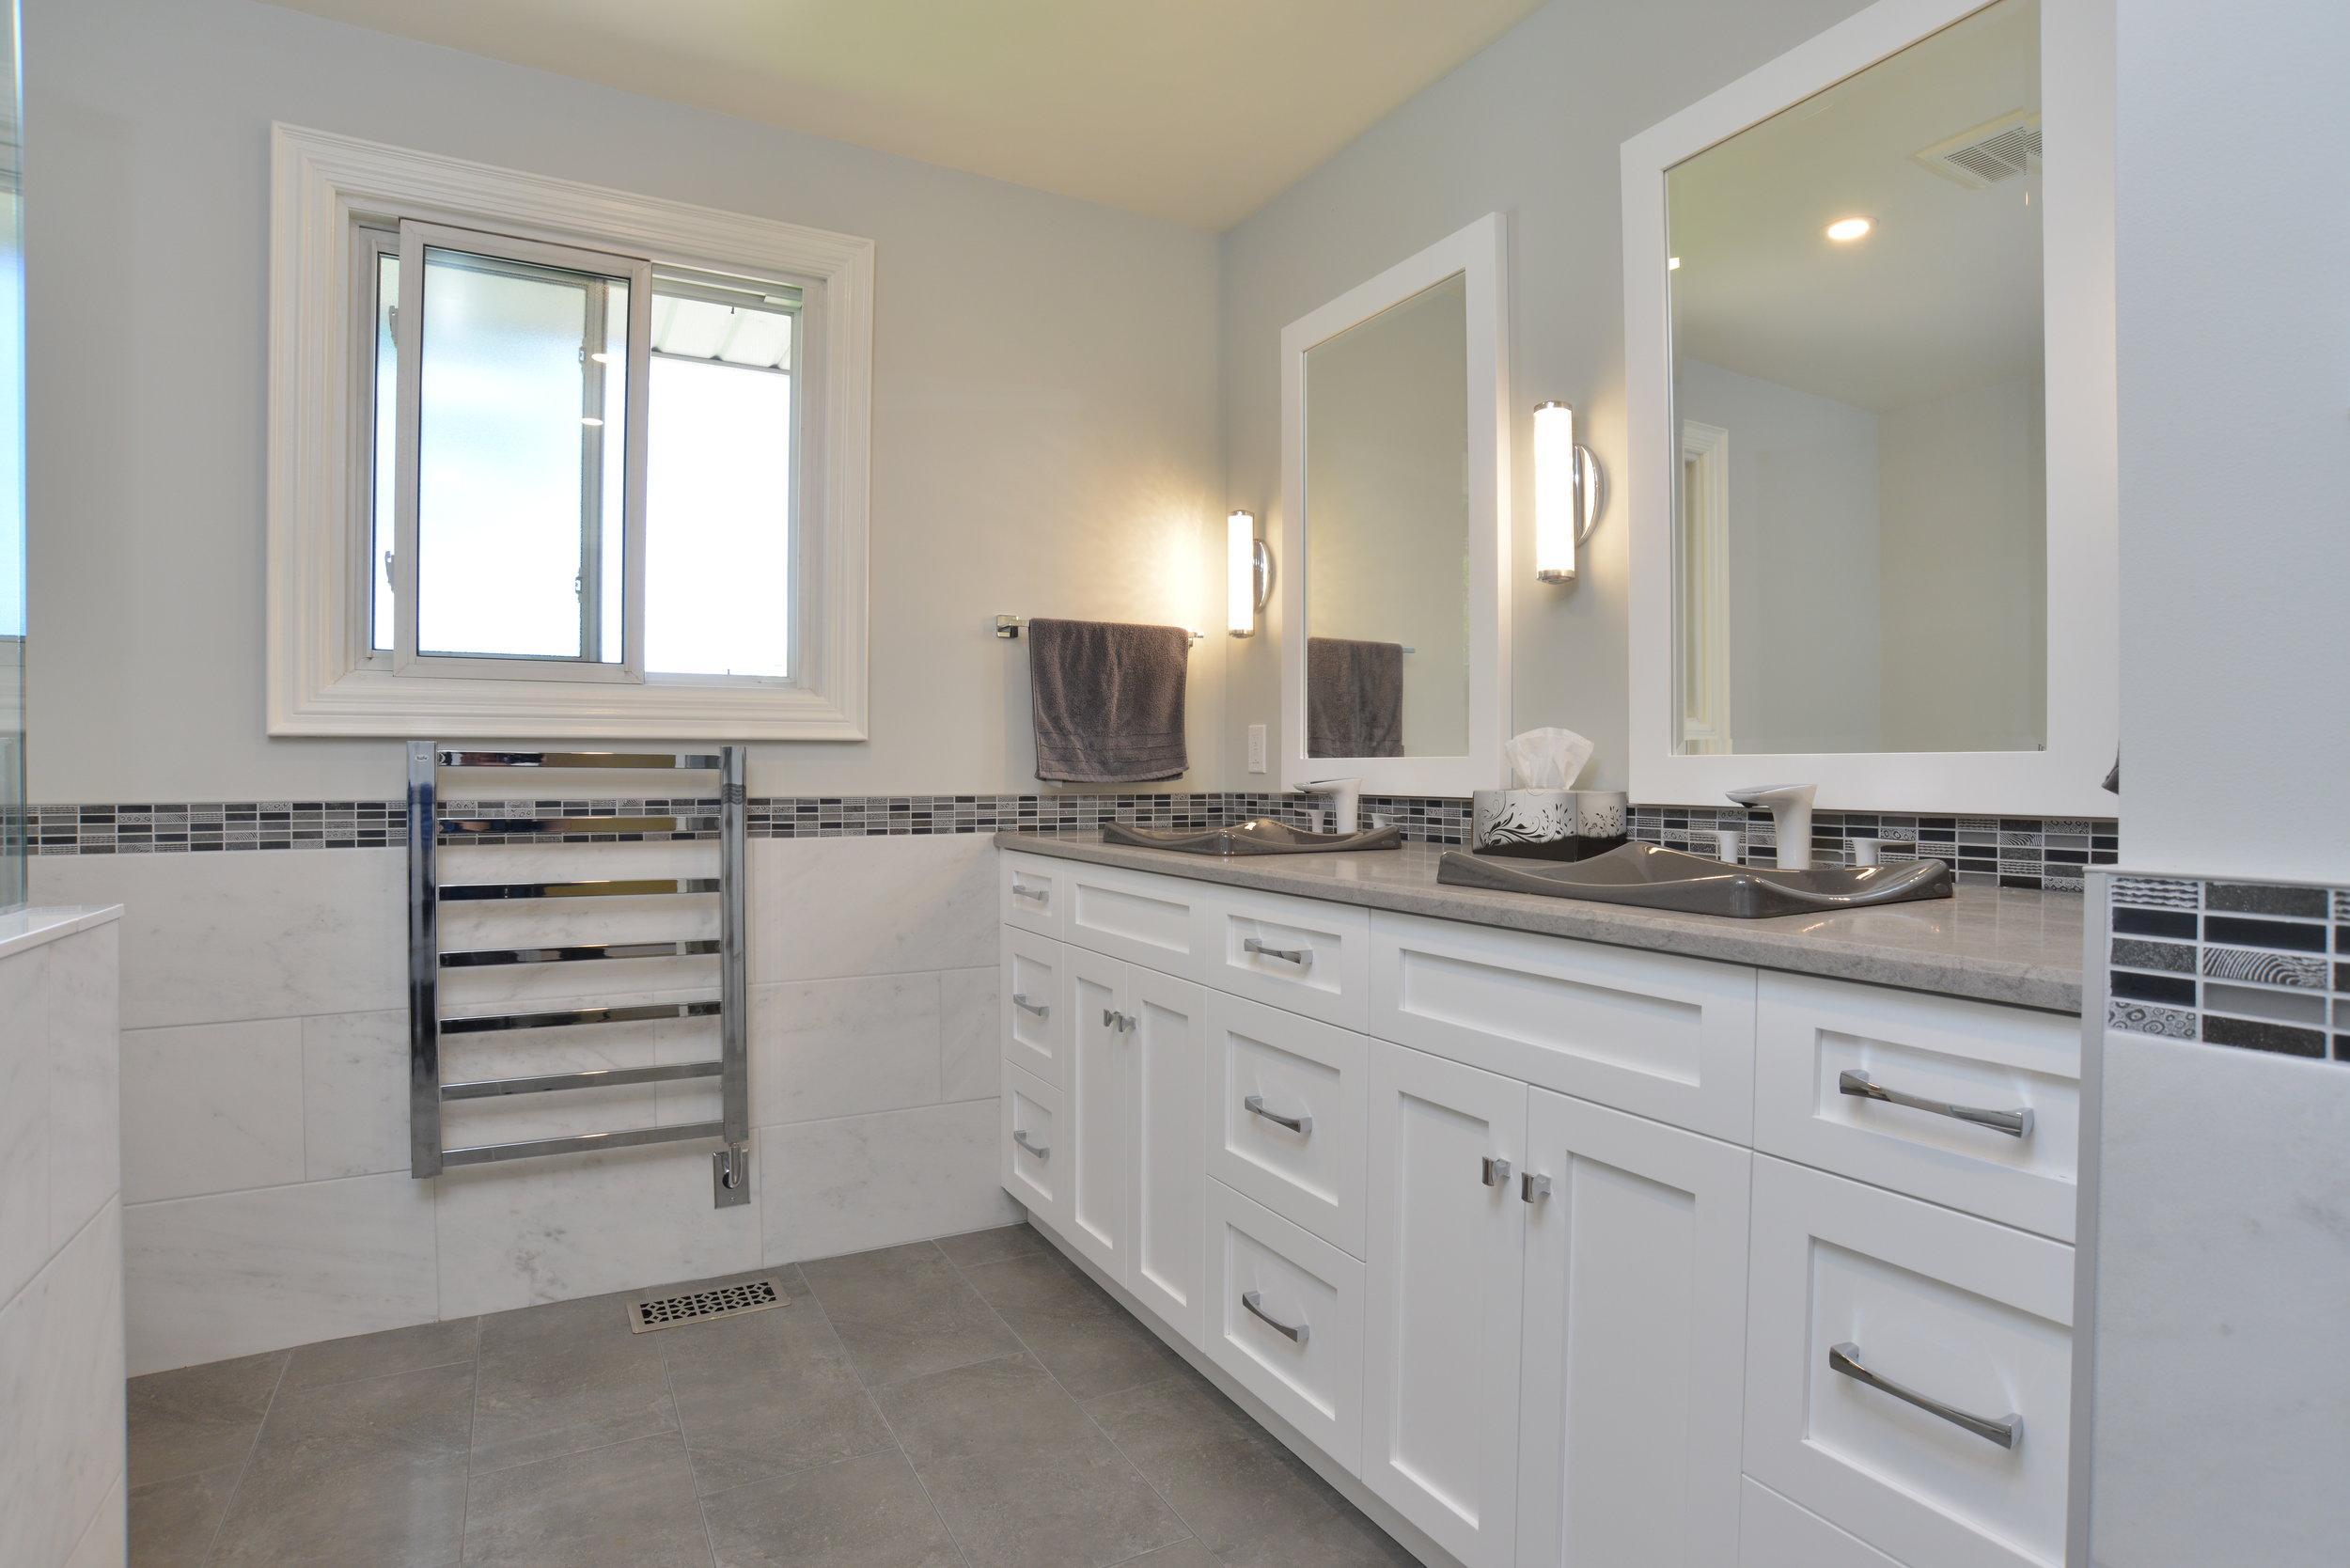 kitchens-bathrooms-03.jpg